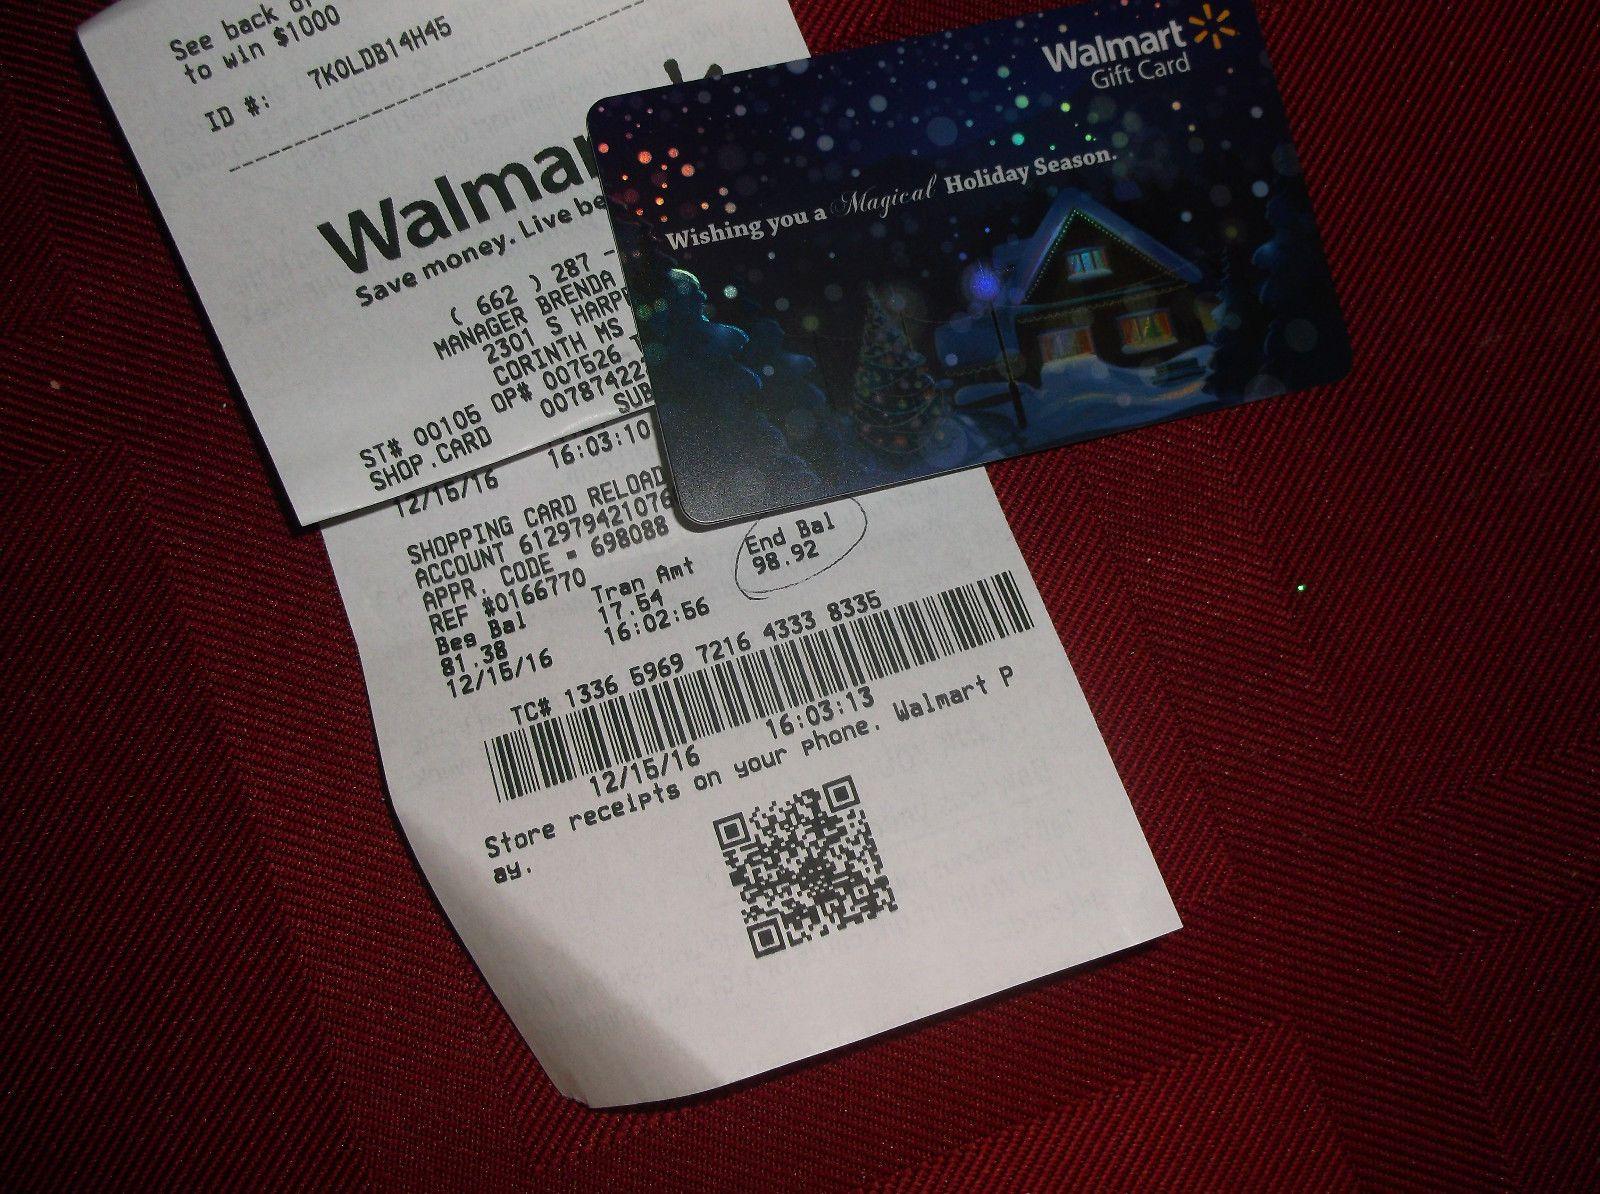 Walmart Gift Card 98 92 Http Searchpromocodes Club Walmart Gift Card 98 92 2